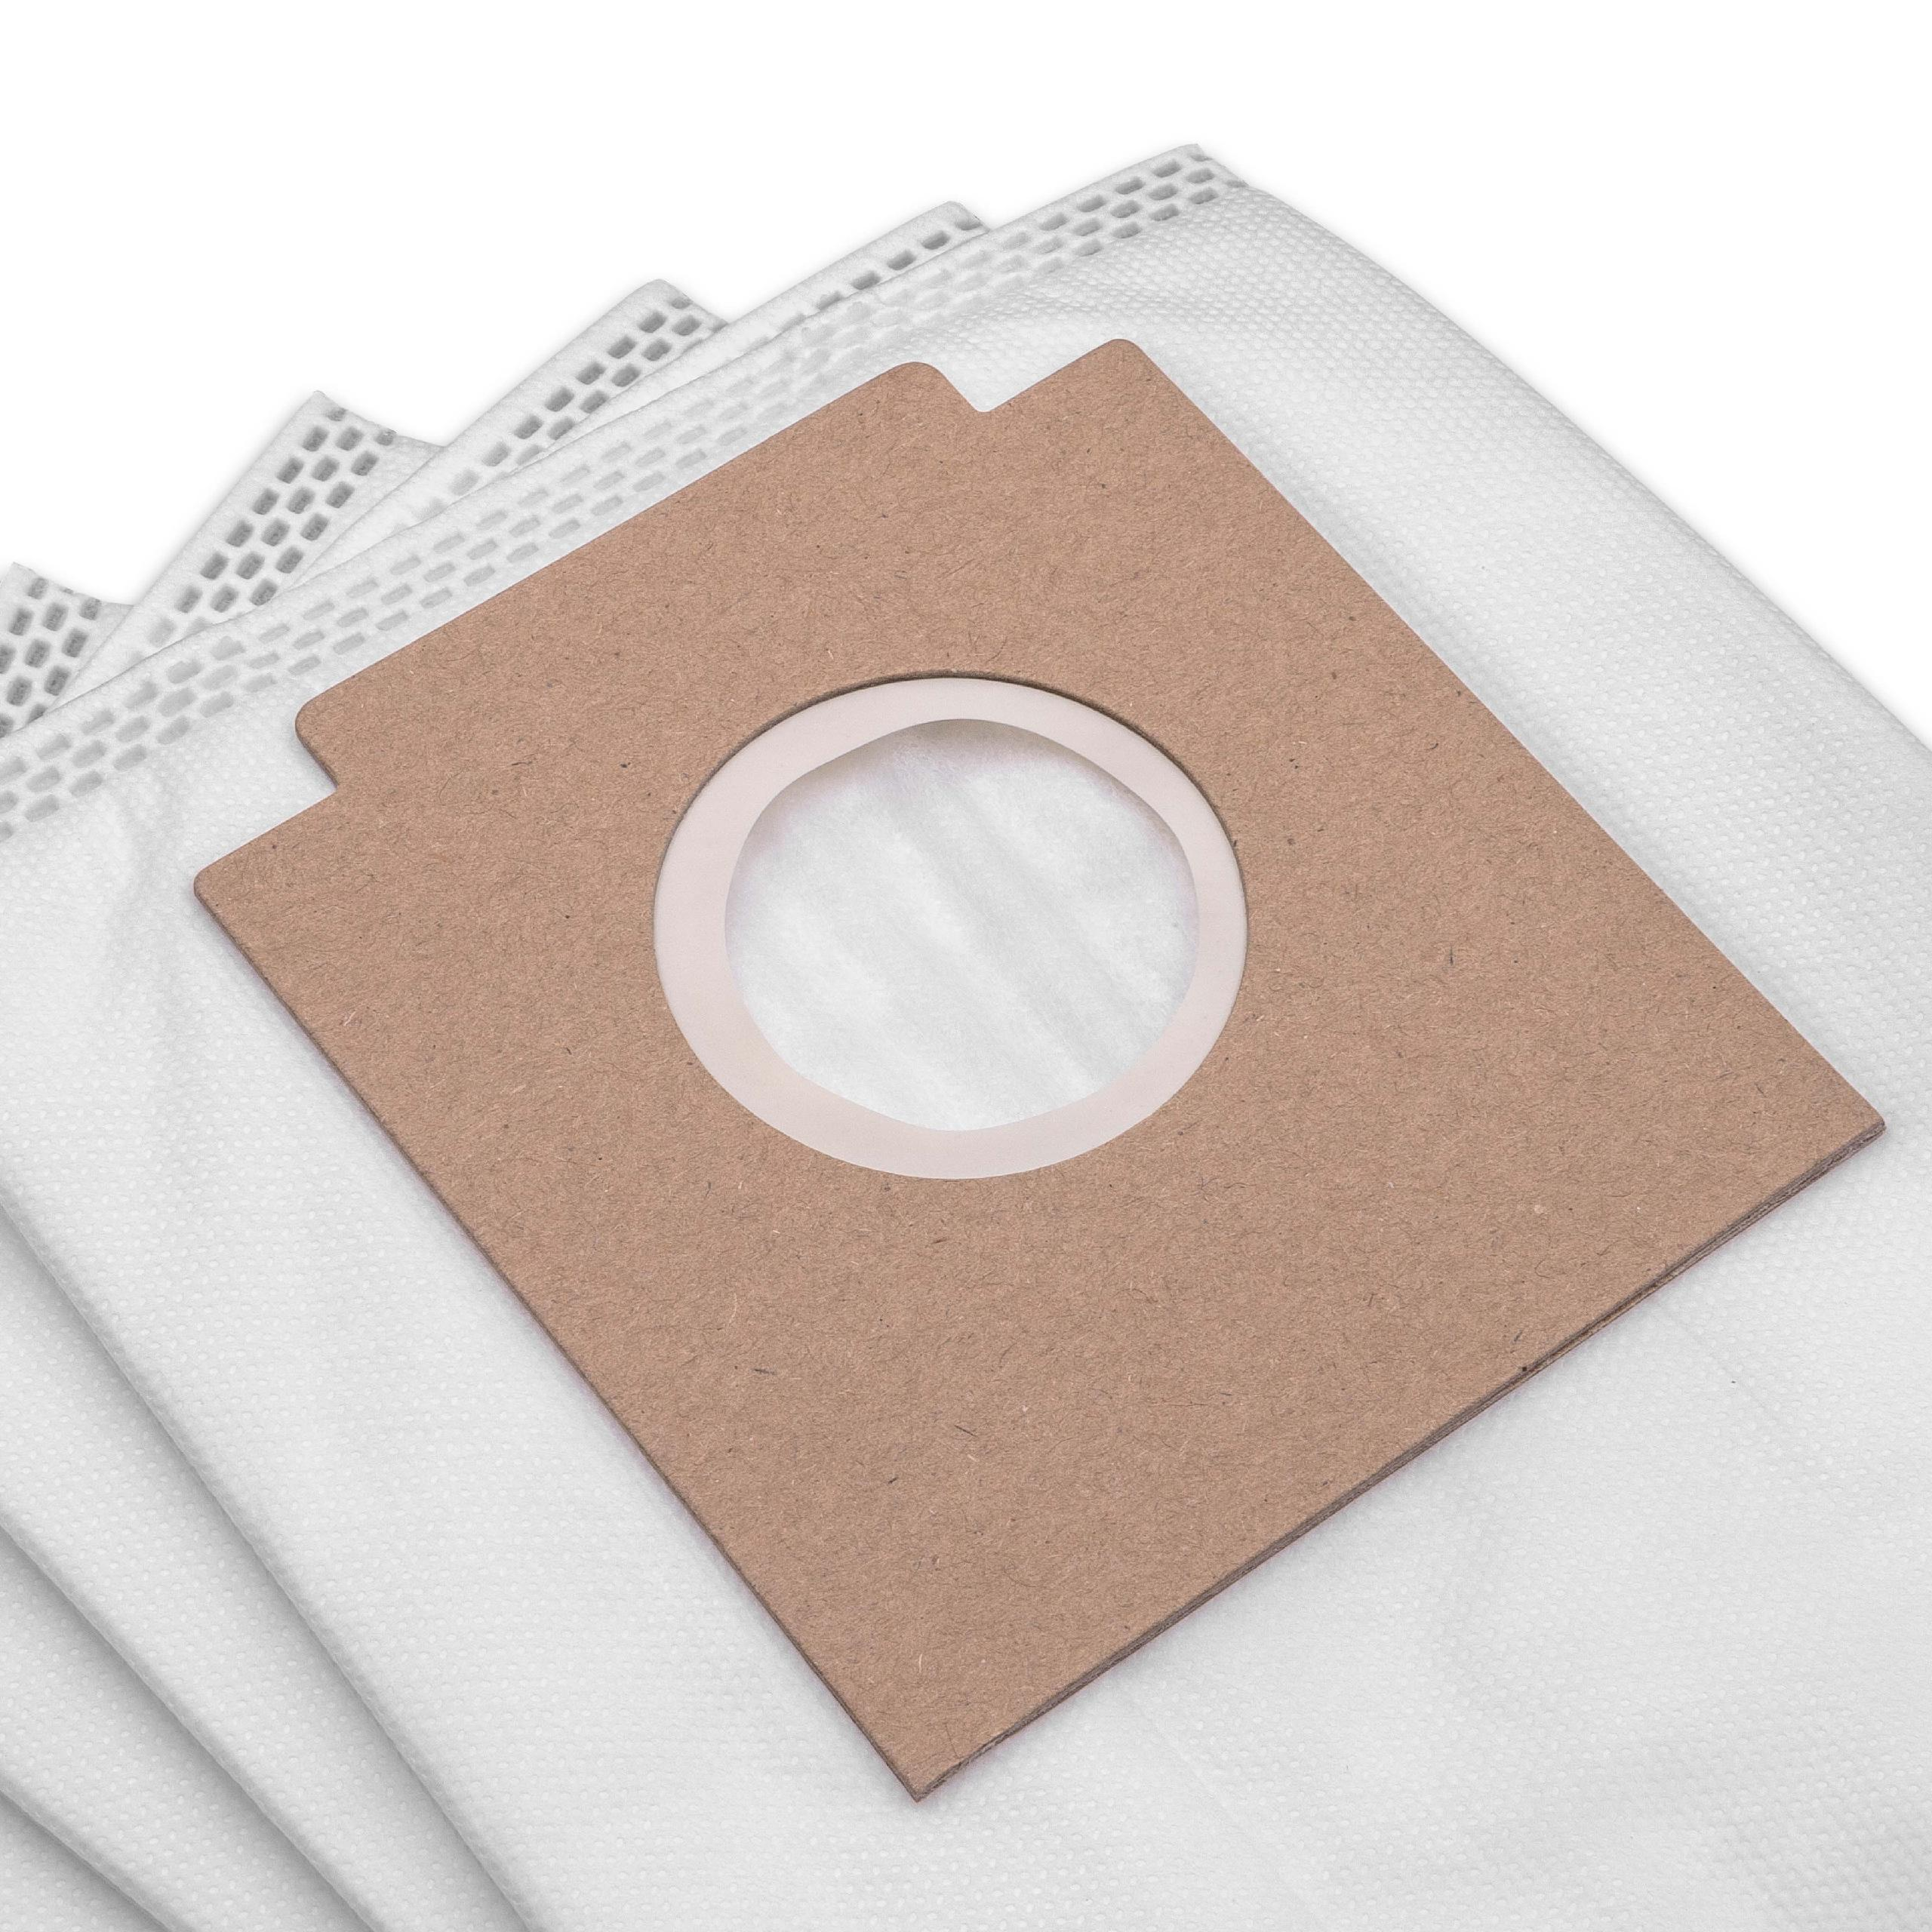 5x Staubsaugerbeutel Micro-Vlies für Dirt Devil 7003022